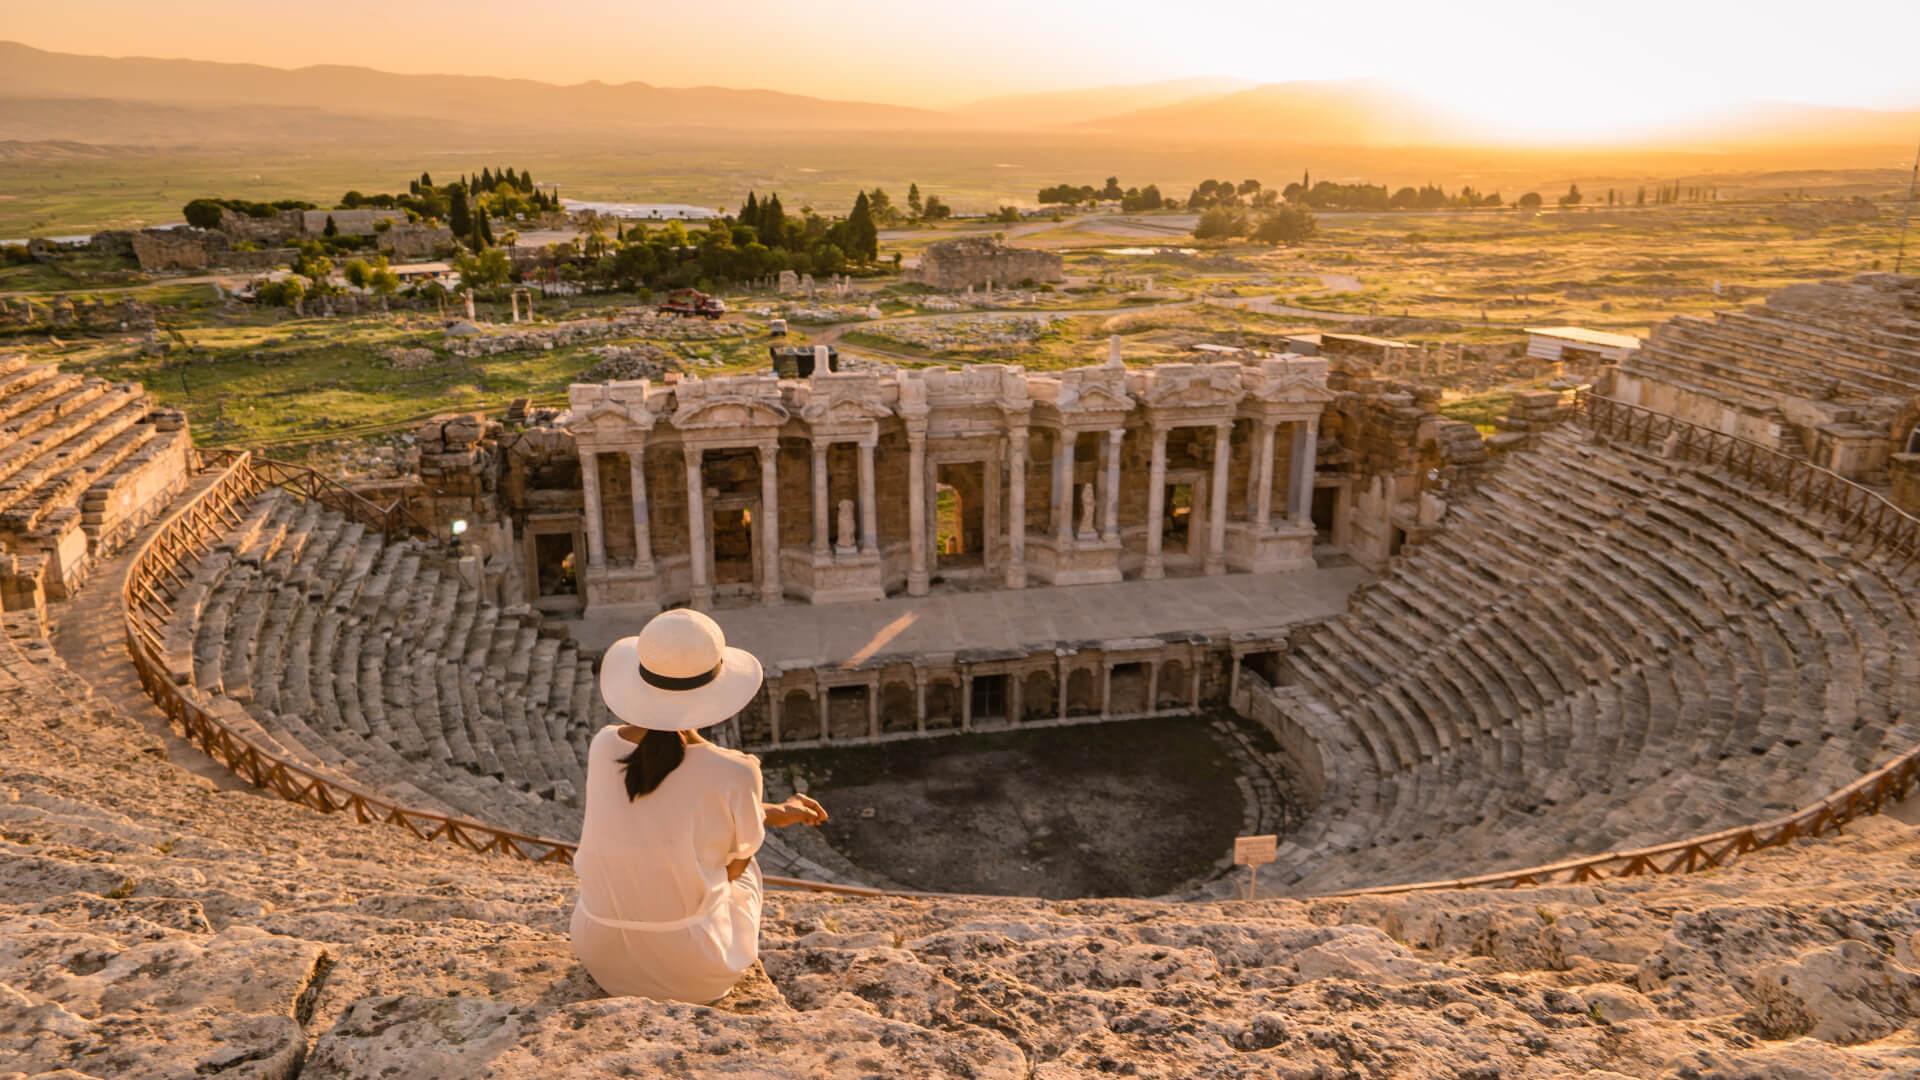 Anadolu'nun Kadim Kenti Hierapolis'in İzinde